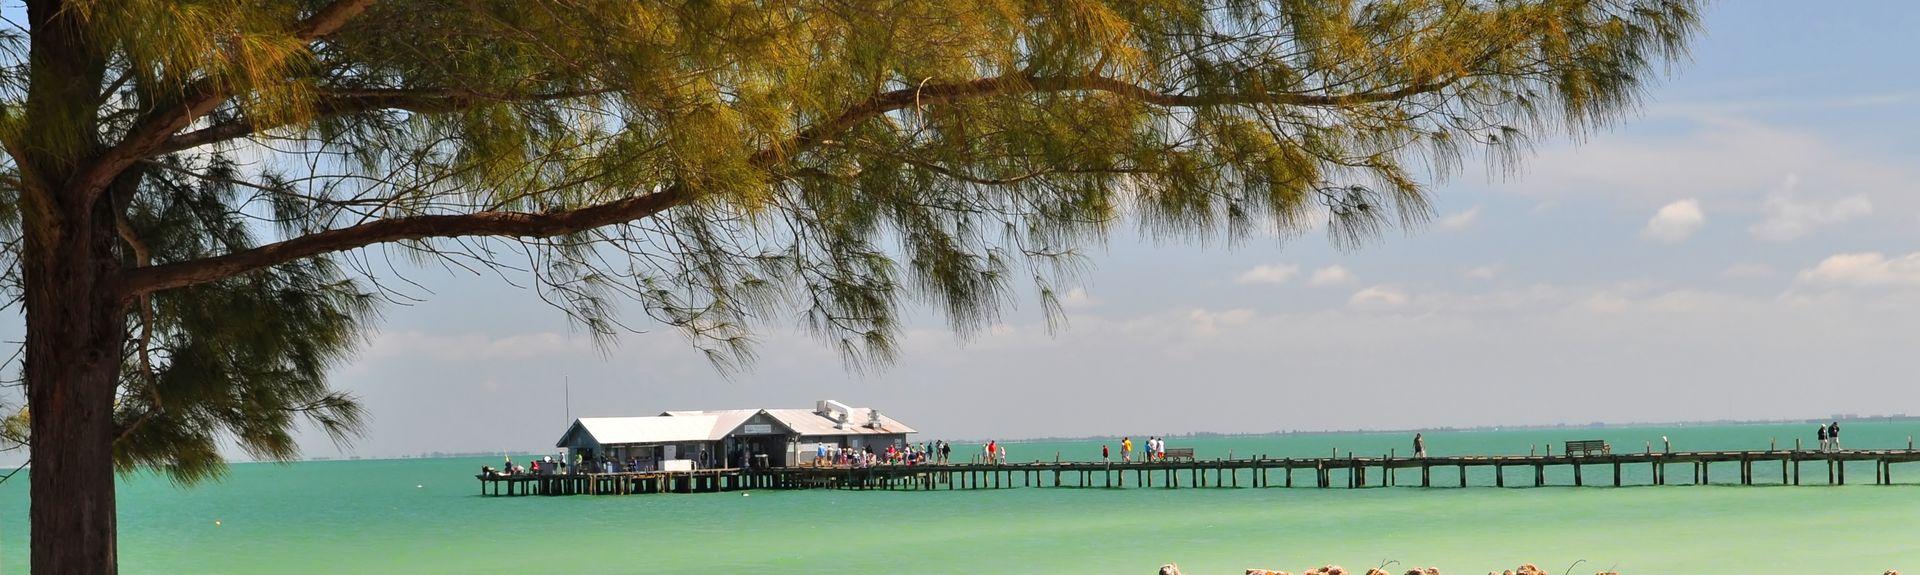 Anna Maria Island, FL, USA